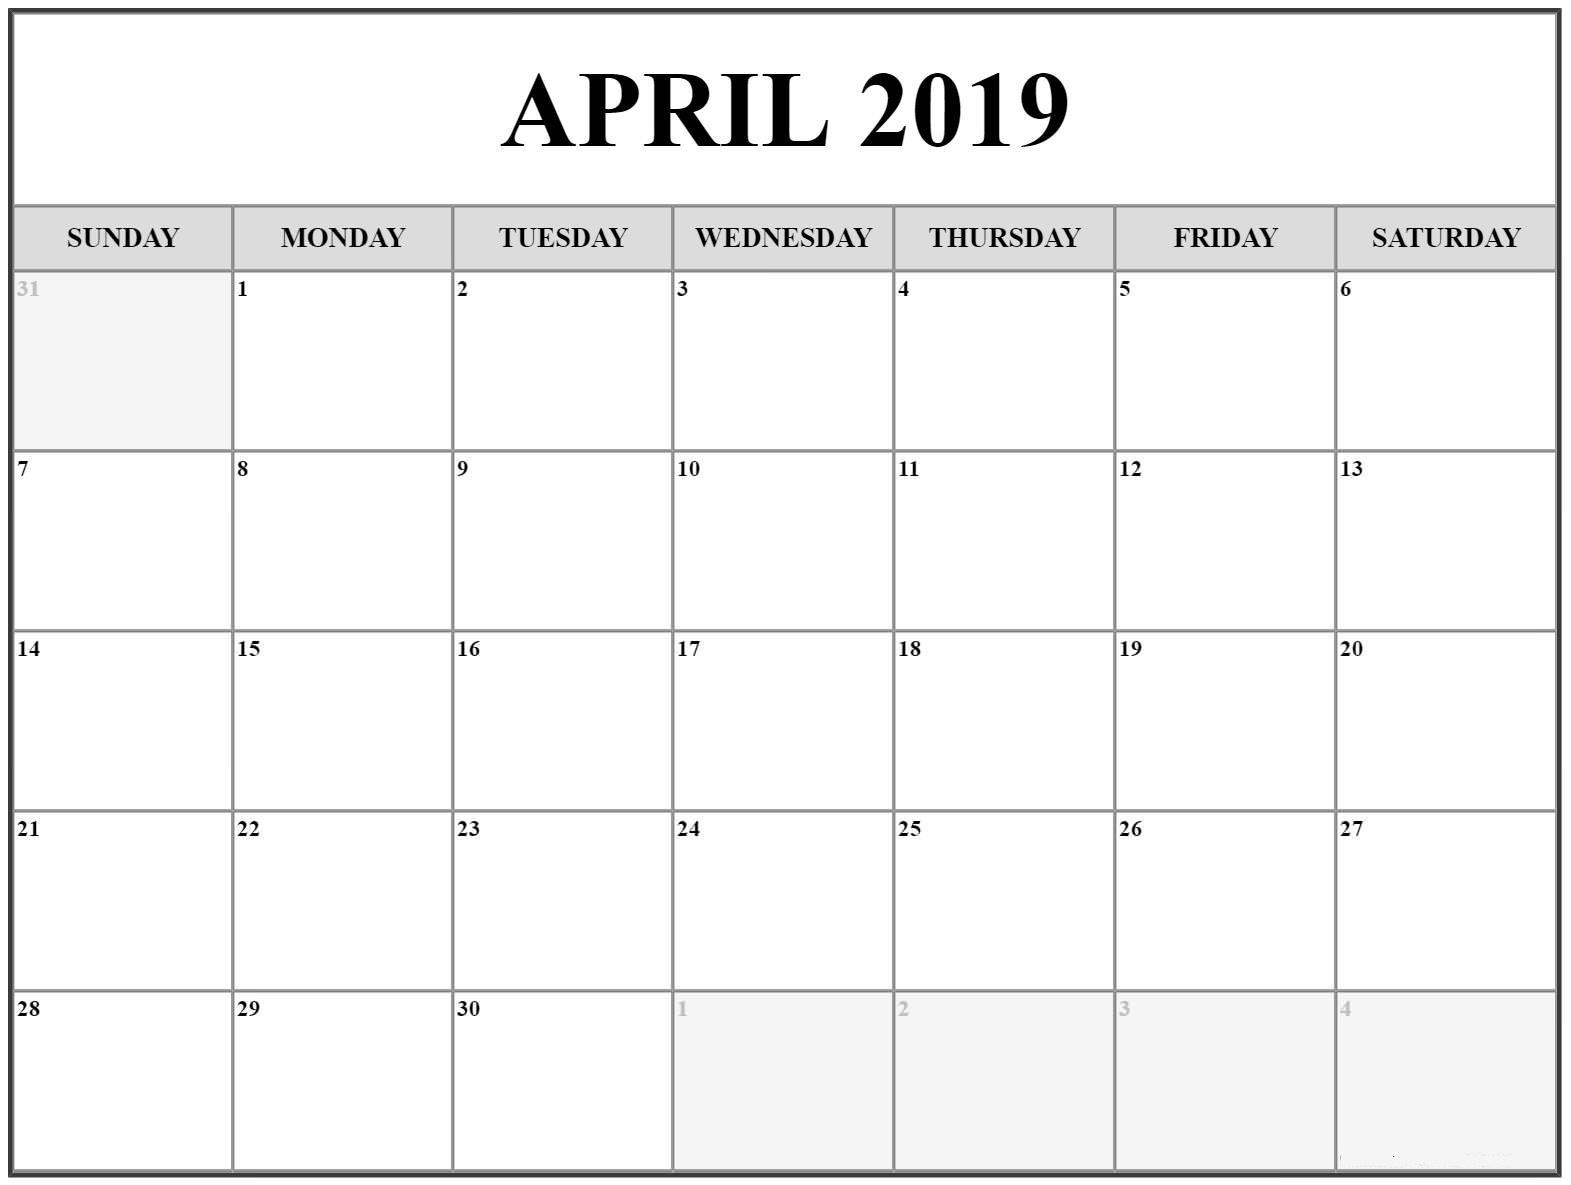 April Calendar 2019 Template